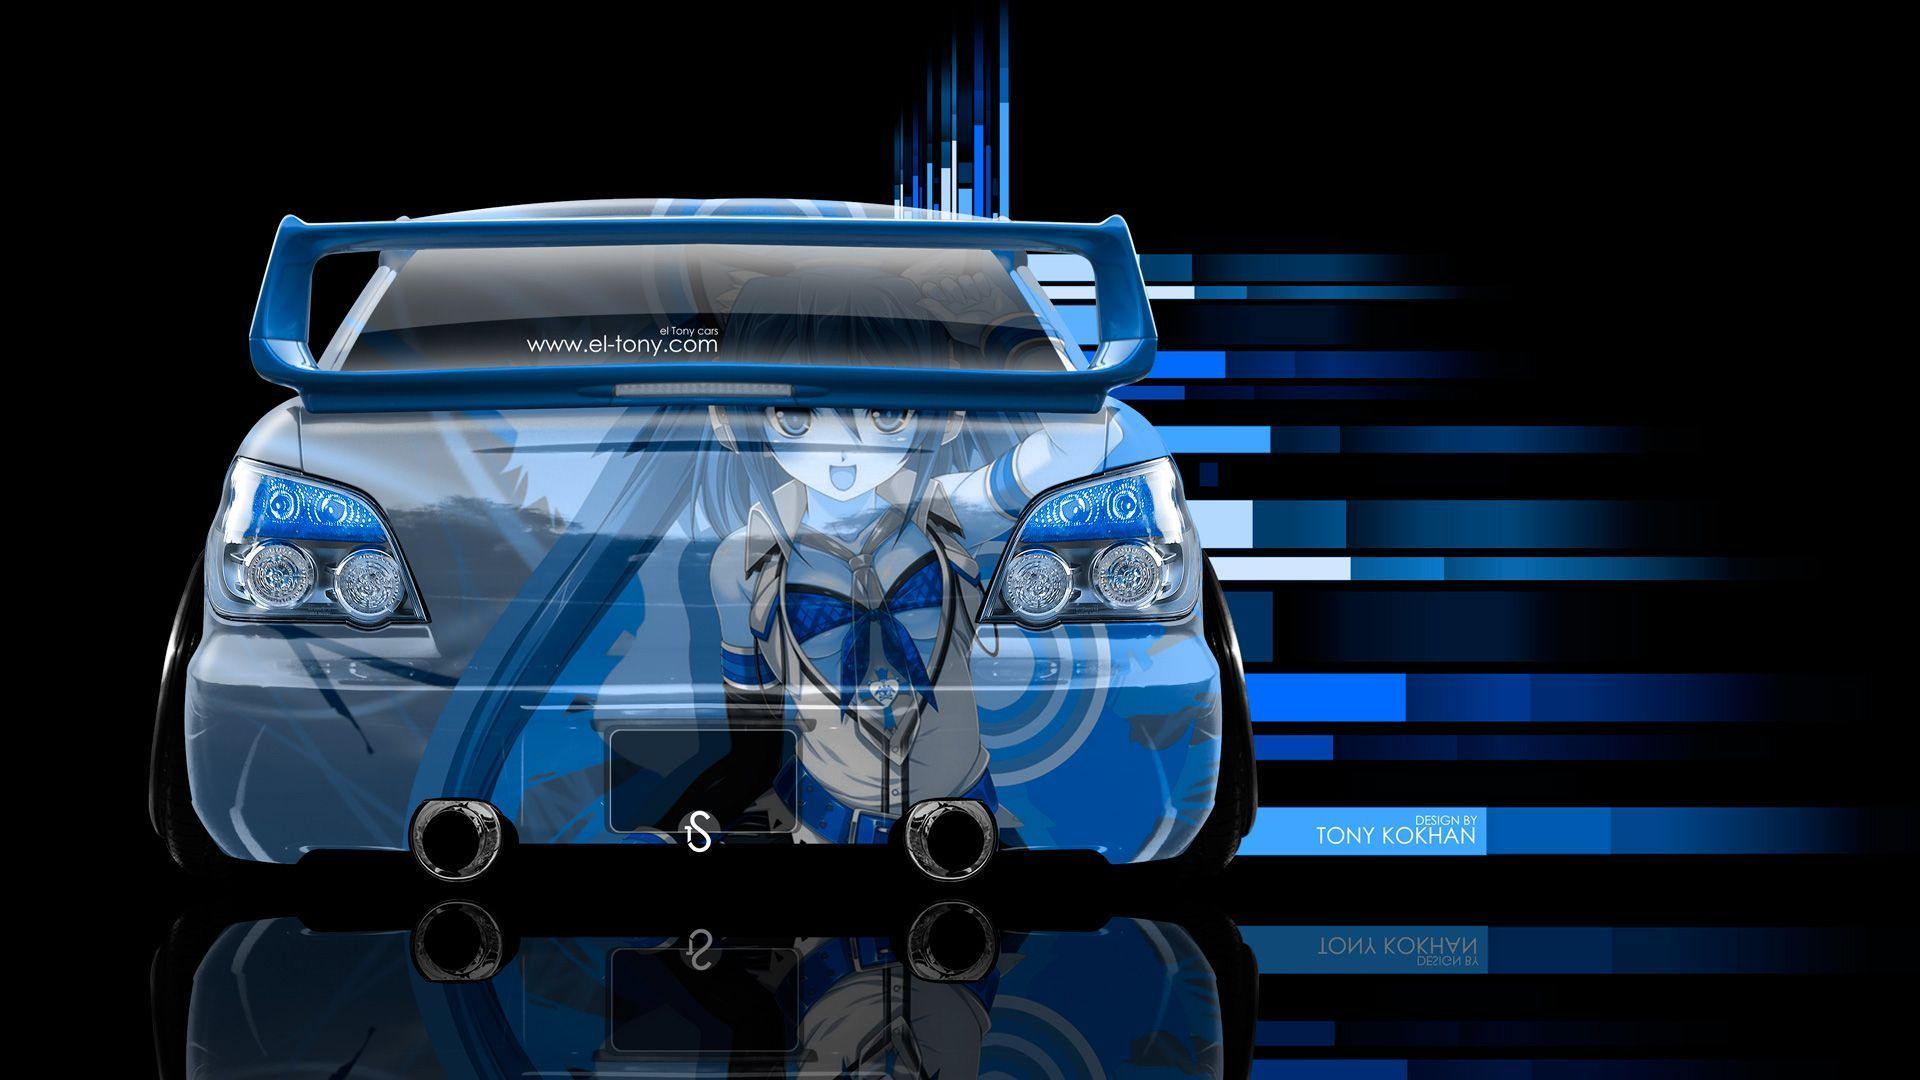 Subaru Impreza WRX STI JDM Crystal Nature Car 2014 Green Grass HD Wallpapers Design By Tony Kokhan [www.el Tony.com]  | El Tony.com | Pinterest | Subaru ...